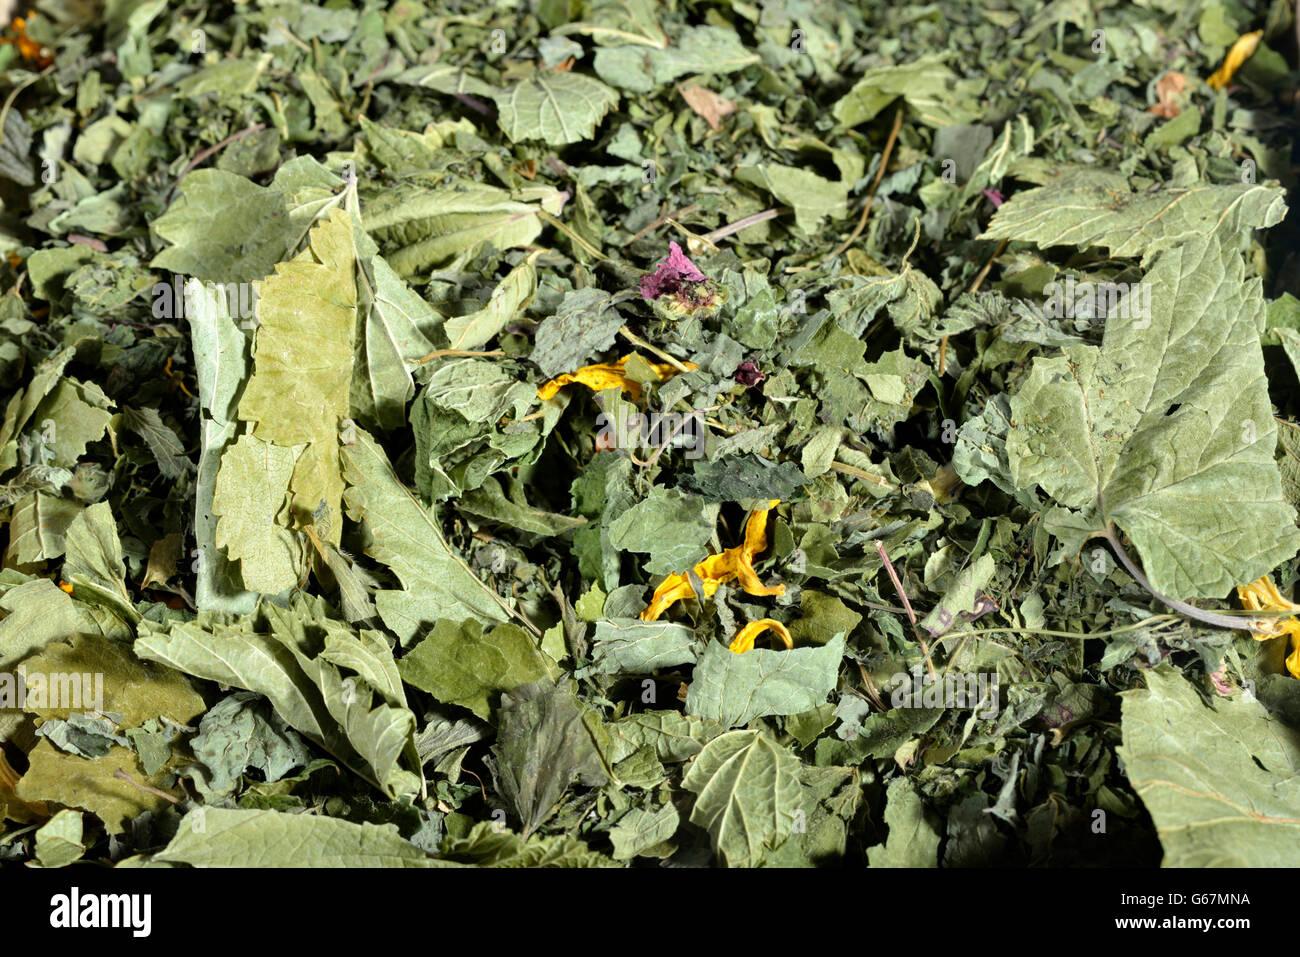 Four seasons tea, blackcurrant, balm, annual sunflower, wild strawberry, woodland strawberry, alpine strawberry, - Stock Image